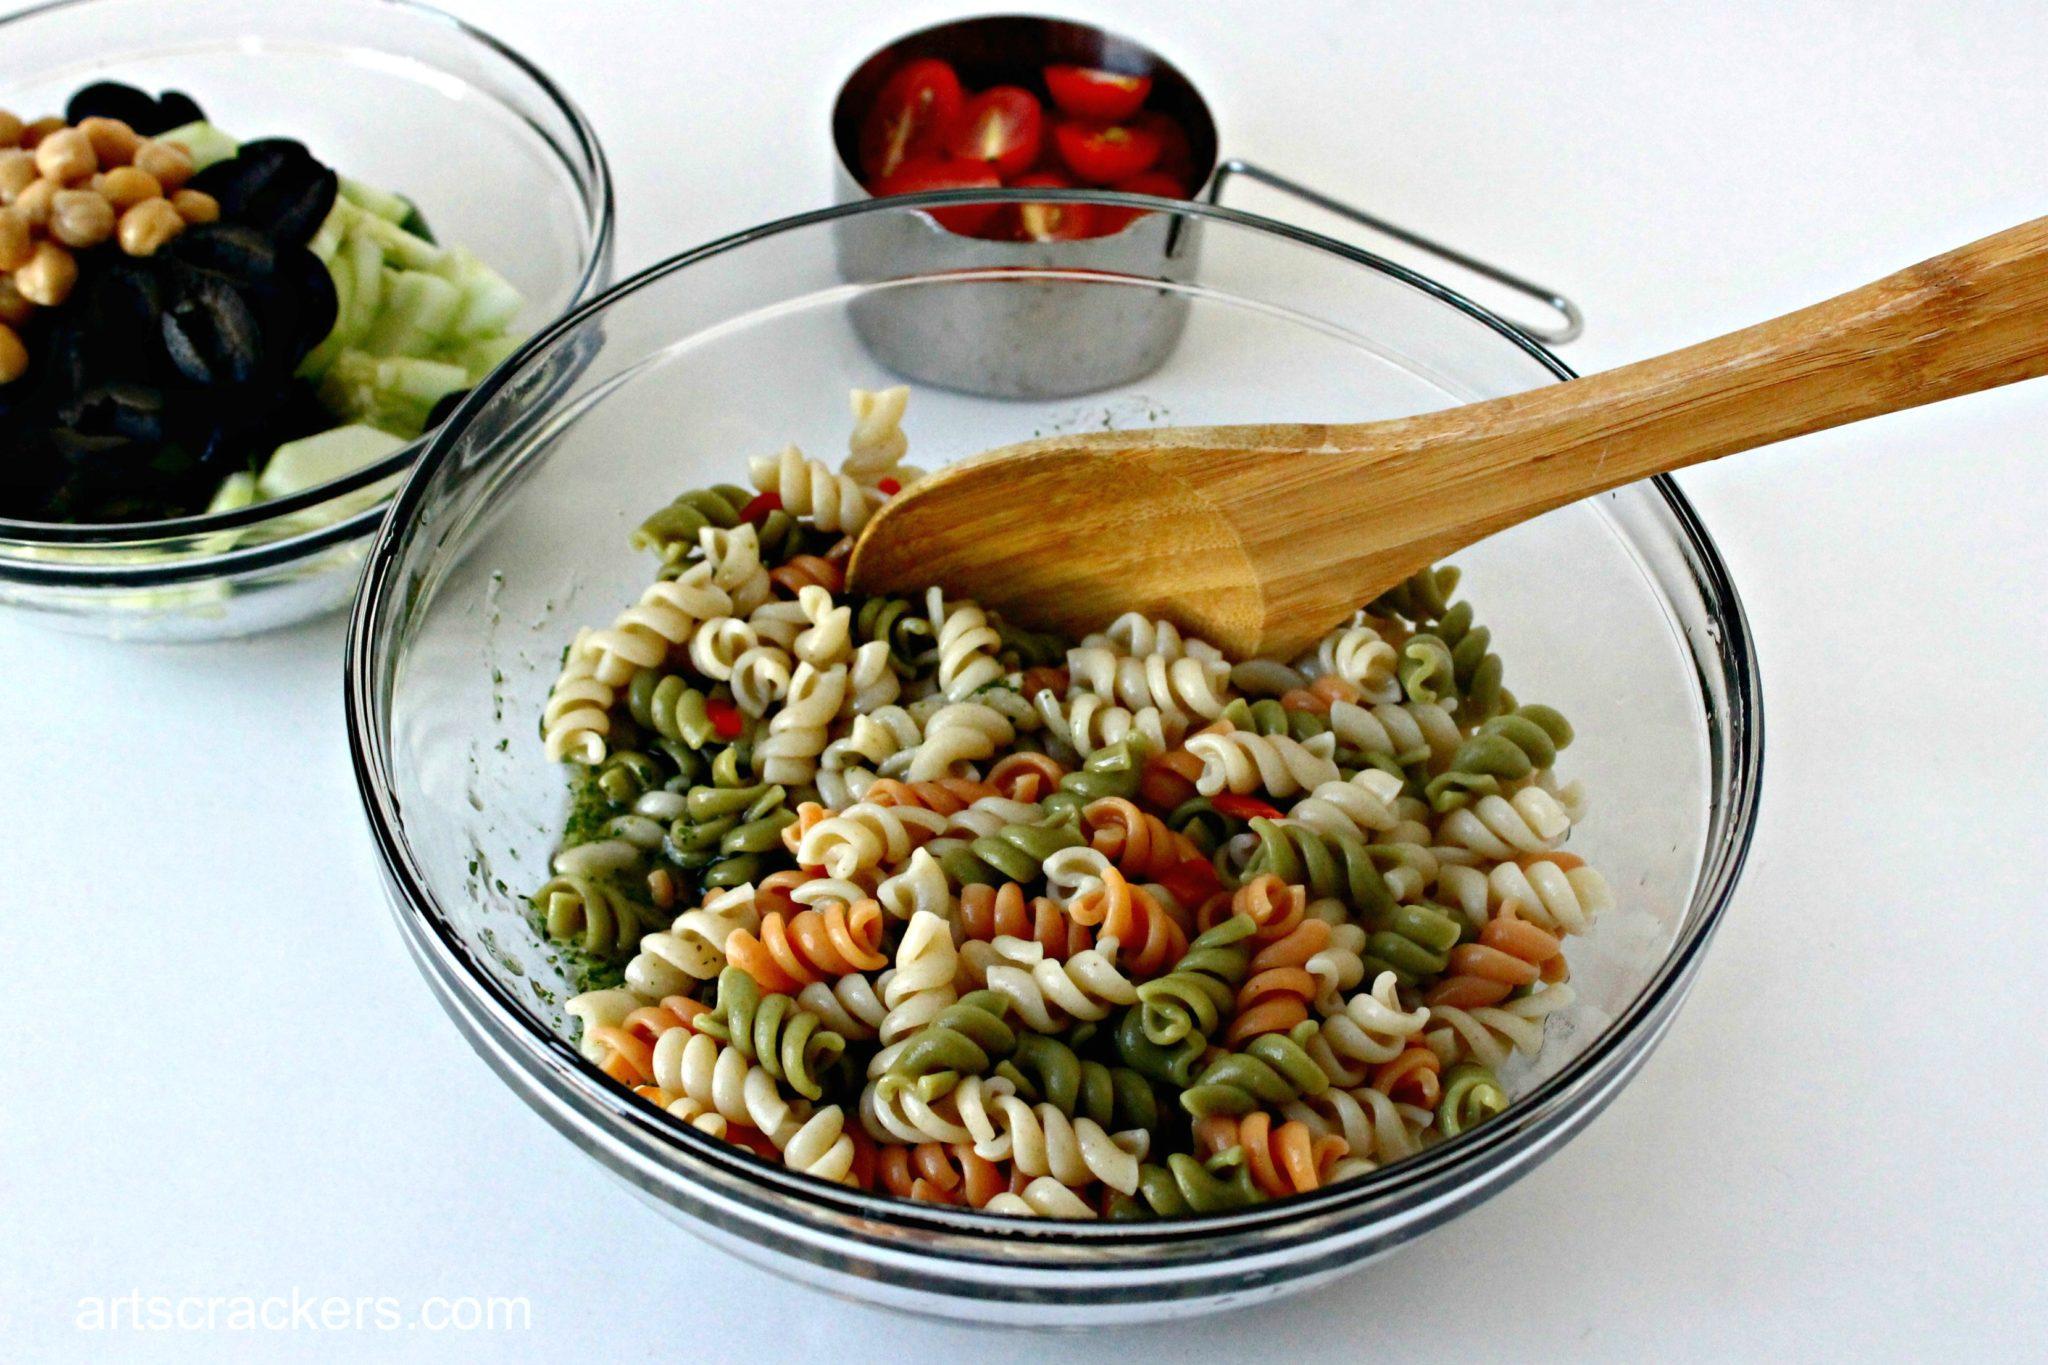 Garden Fresh Pasta Salad with Suddenly Salad Recipe